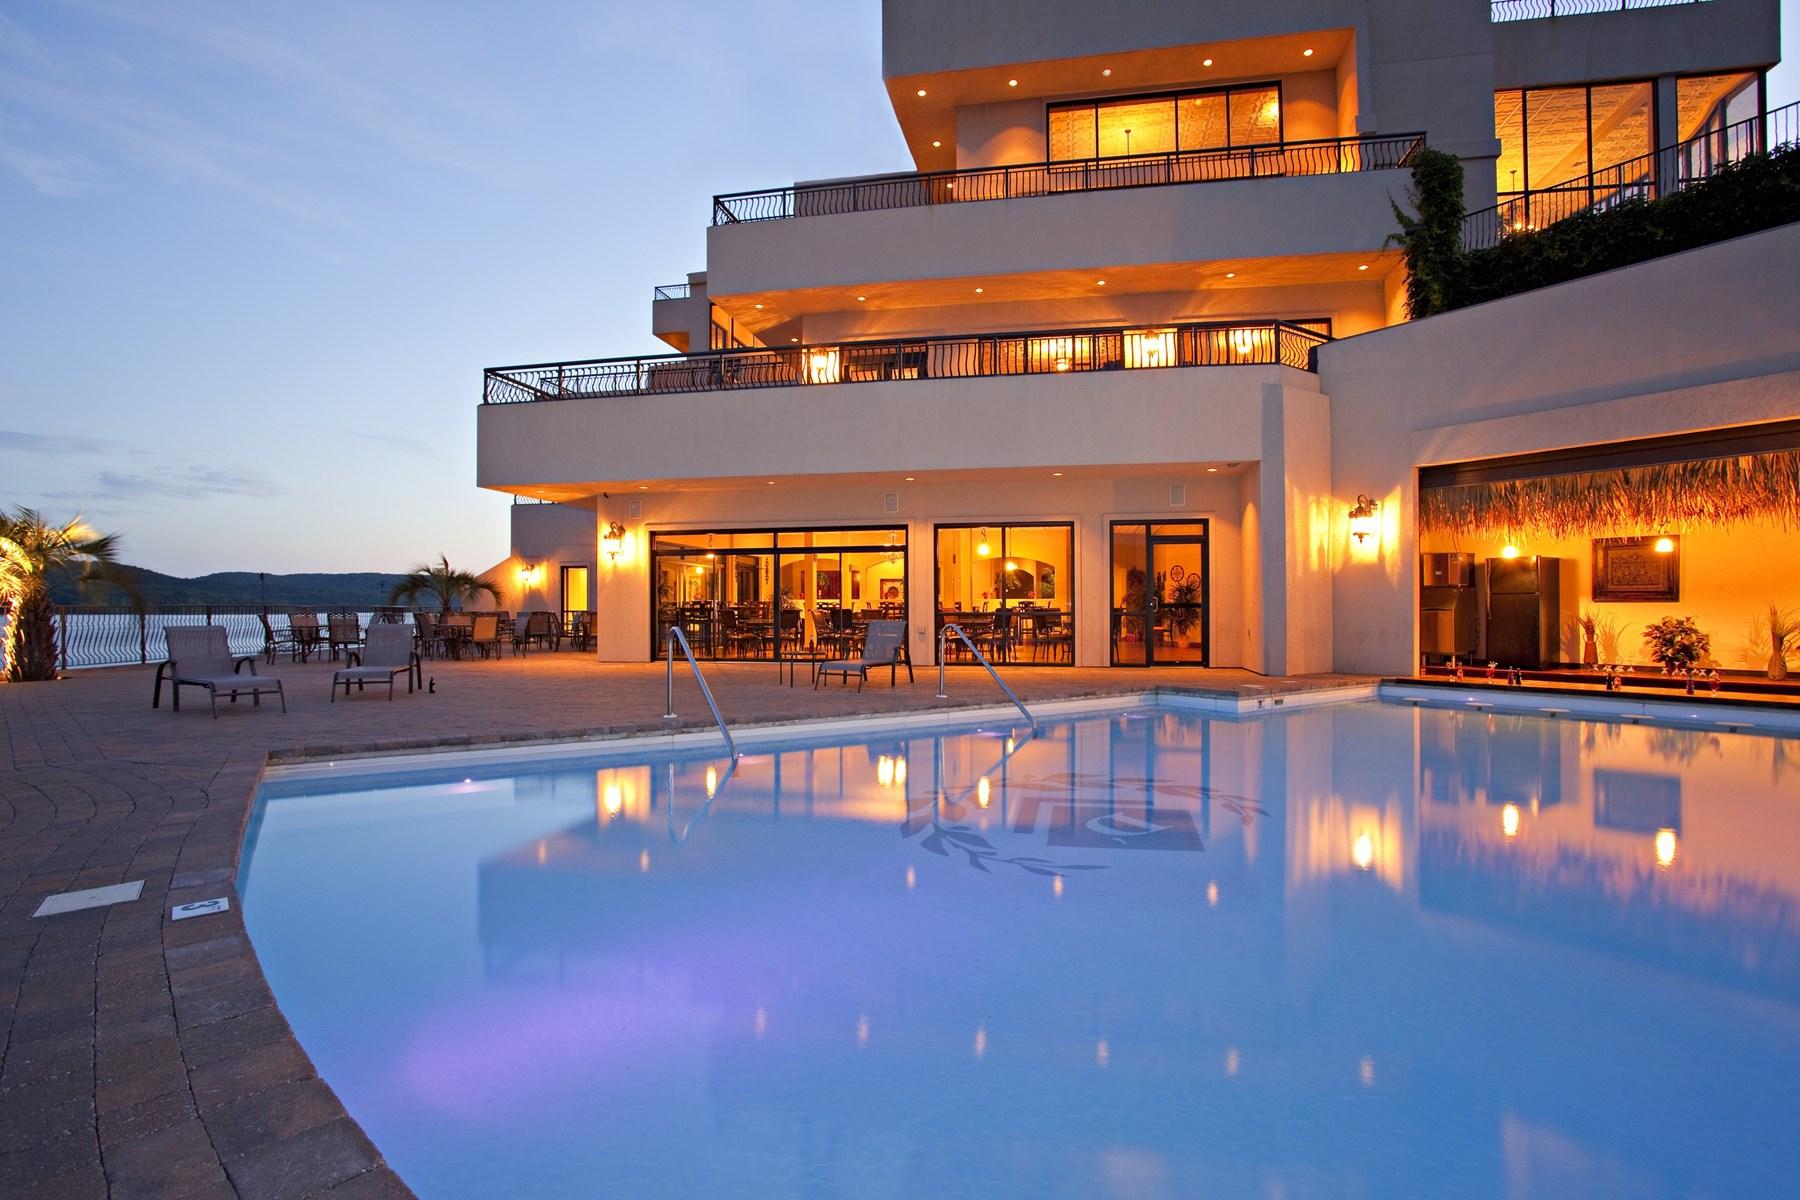 For Sale * D'Monaco Luxury Resort * Table Rock Lake, Mo